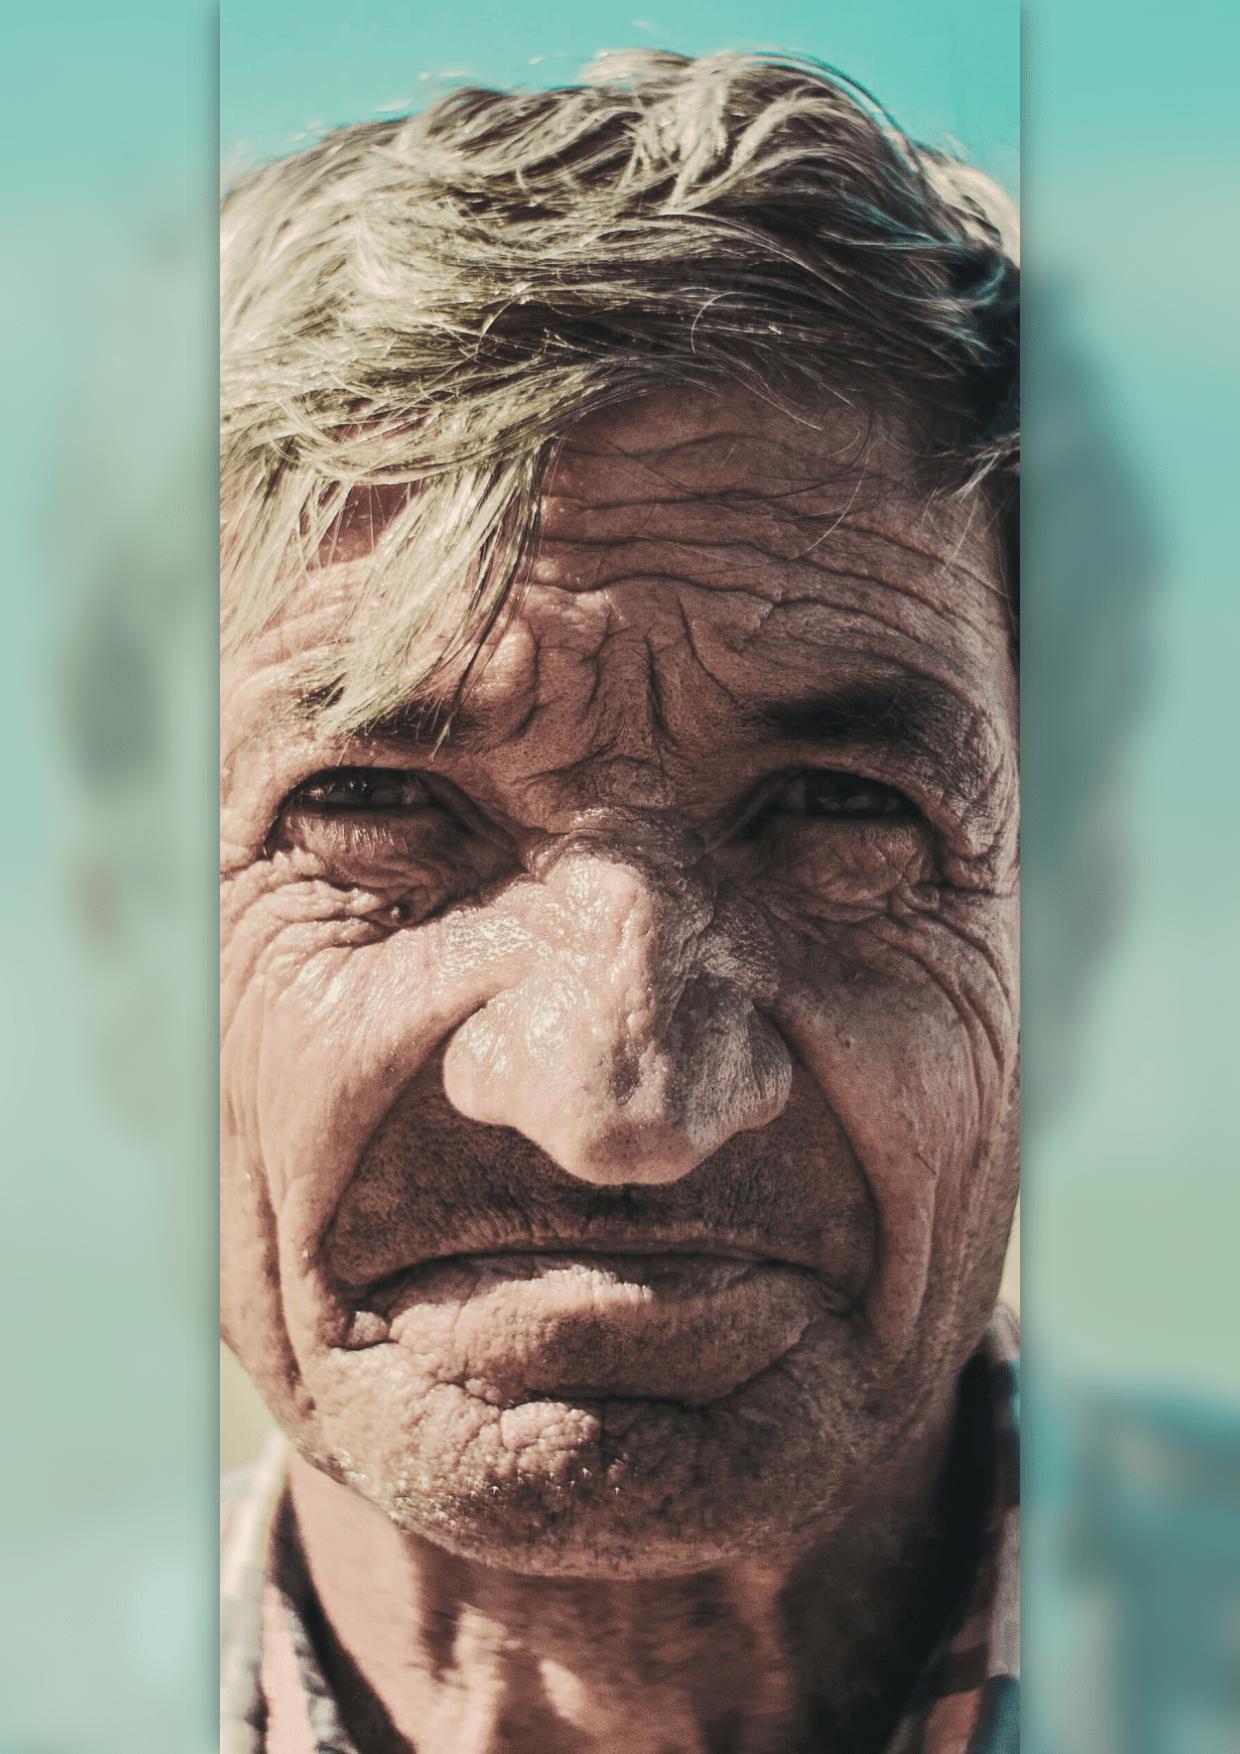 Face,                Head,                Portrait,                Facial,                Hair,                Mockup,                Frame,                Image,                Avatar,                White,                Black,                 Free Image